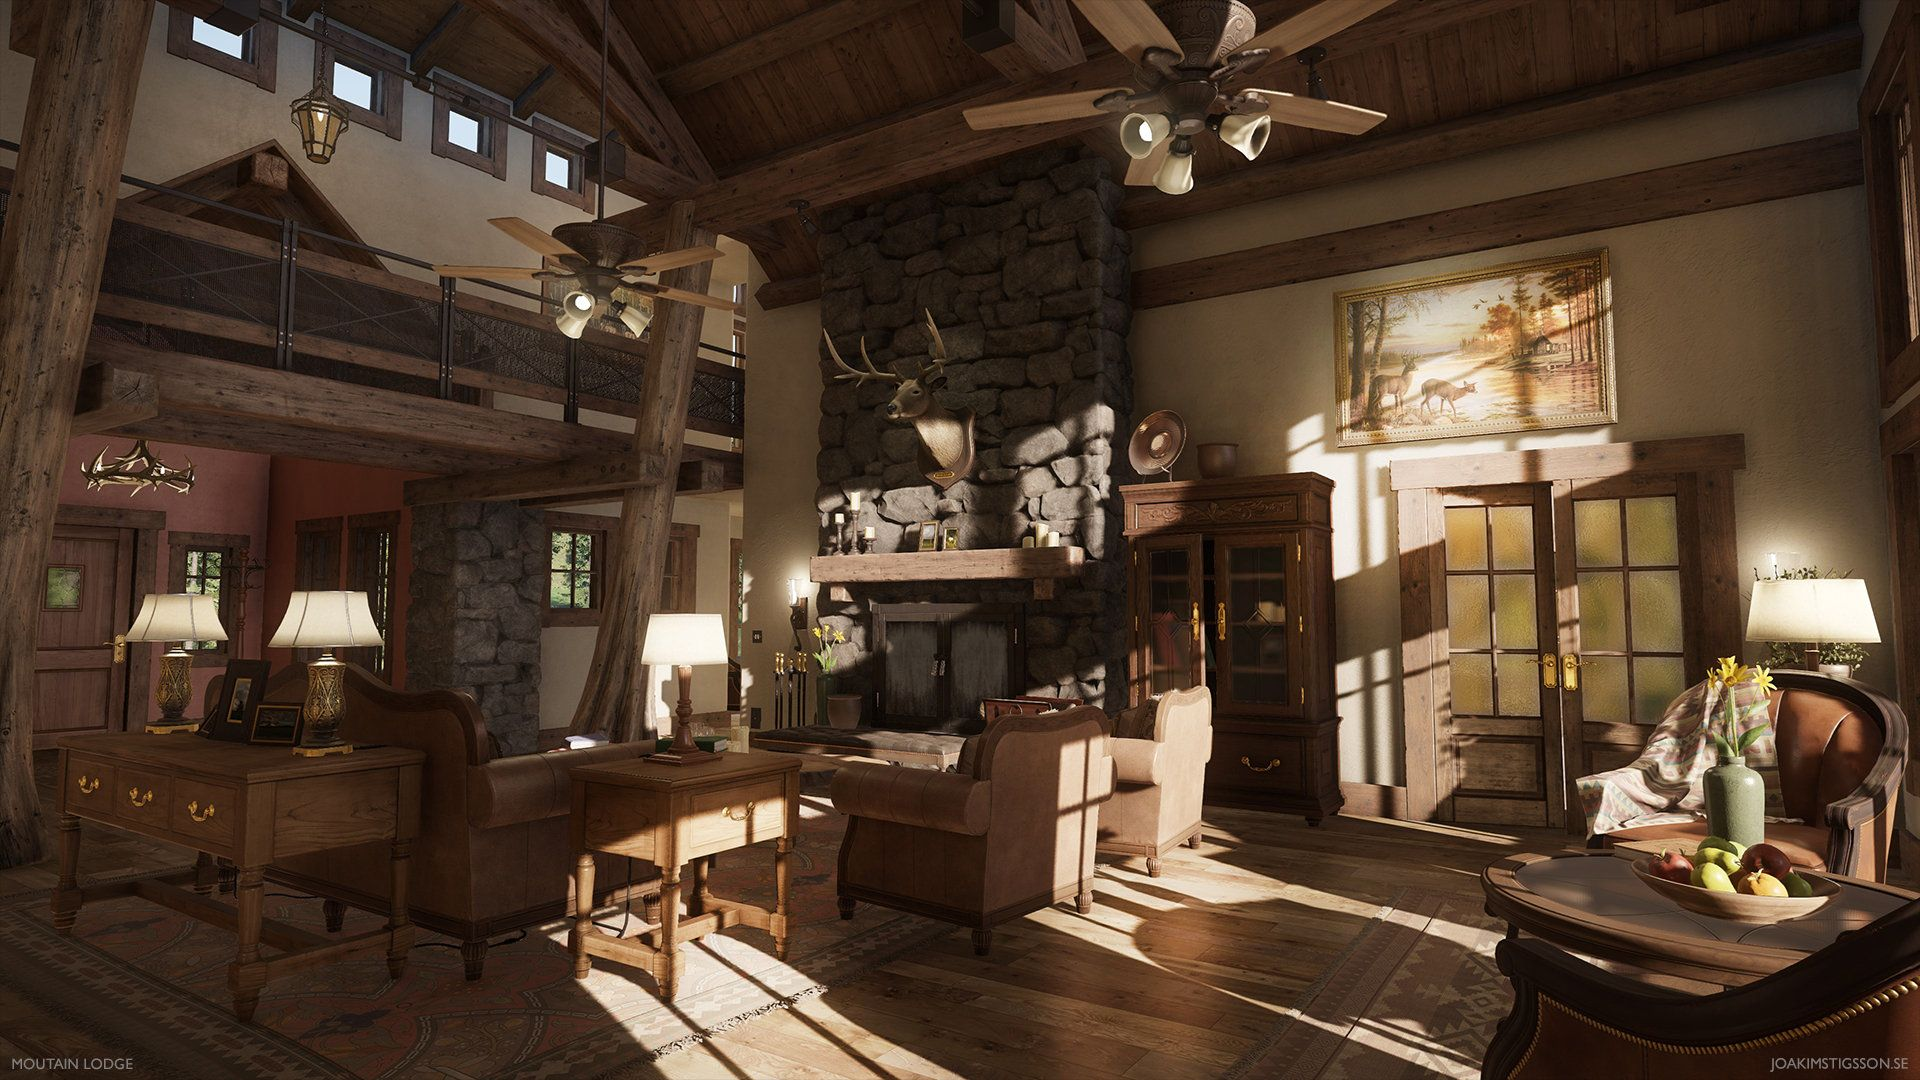 ArtStation - Mountain Lodge, Joakim Stigsson